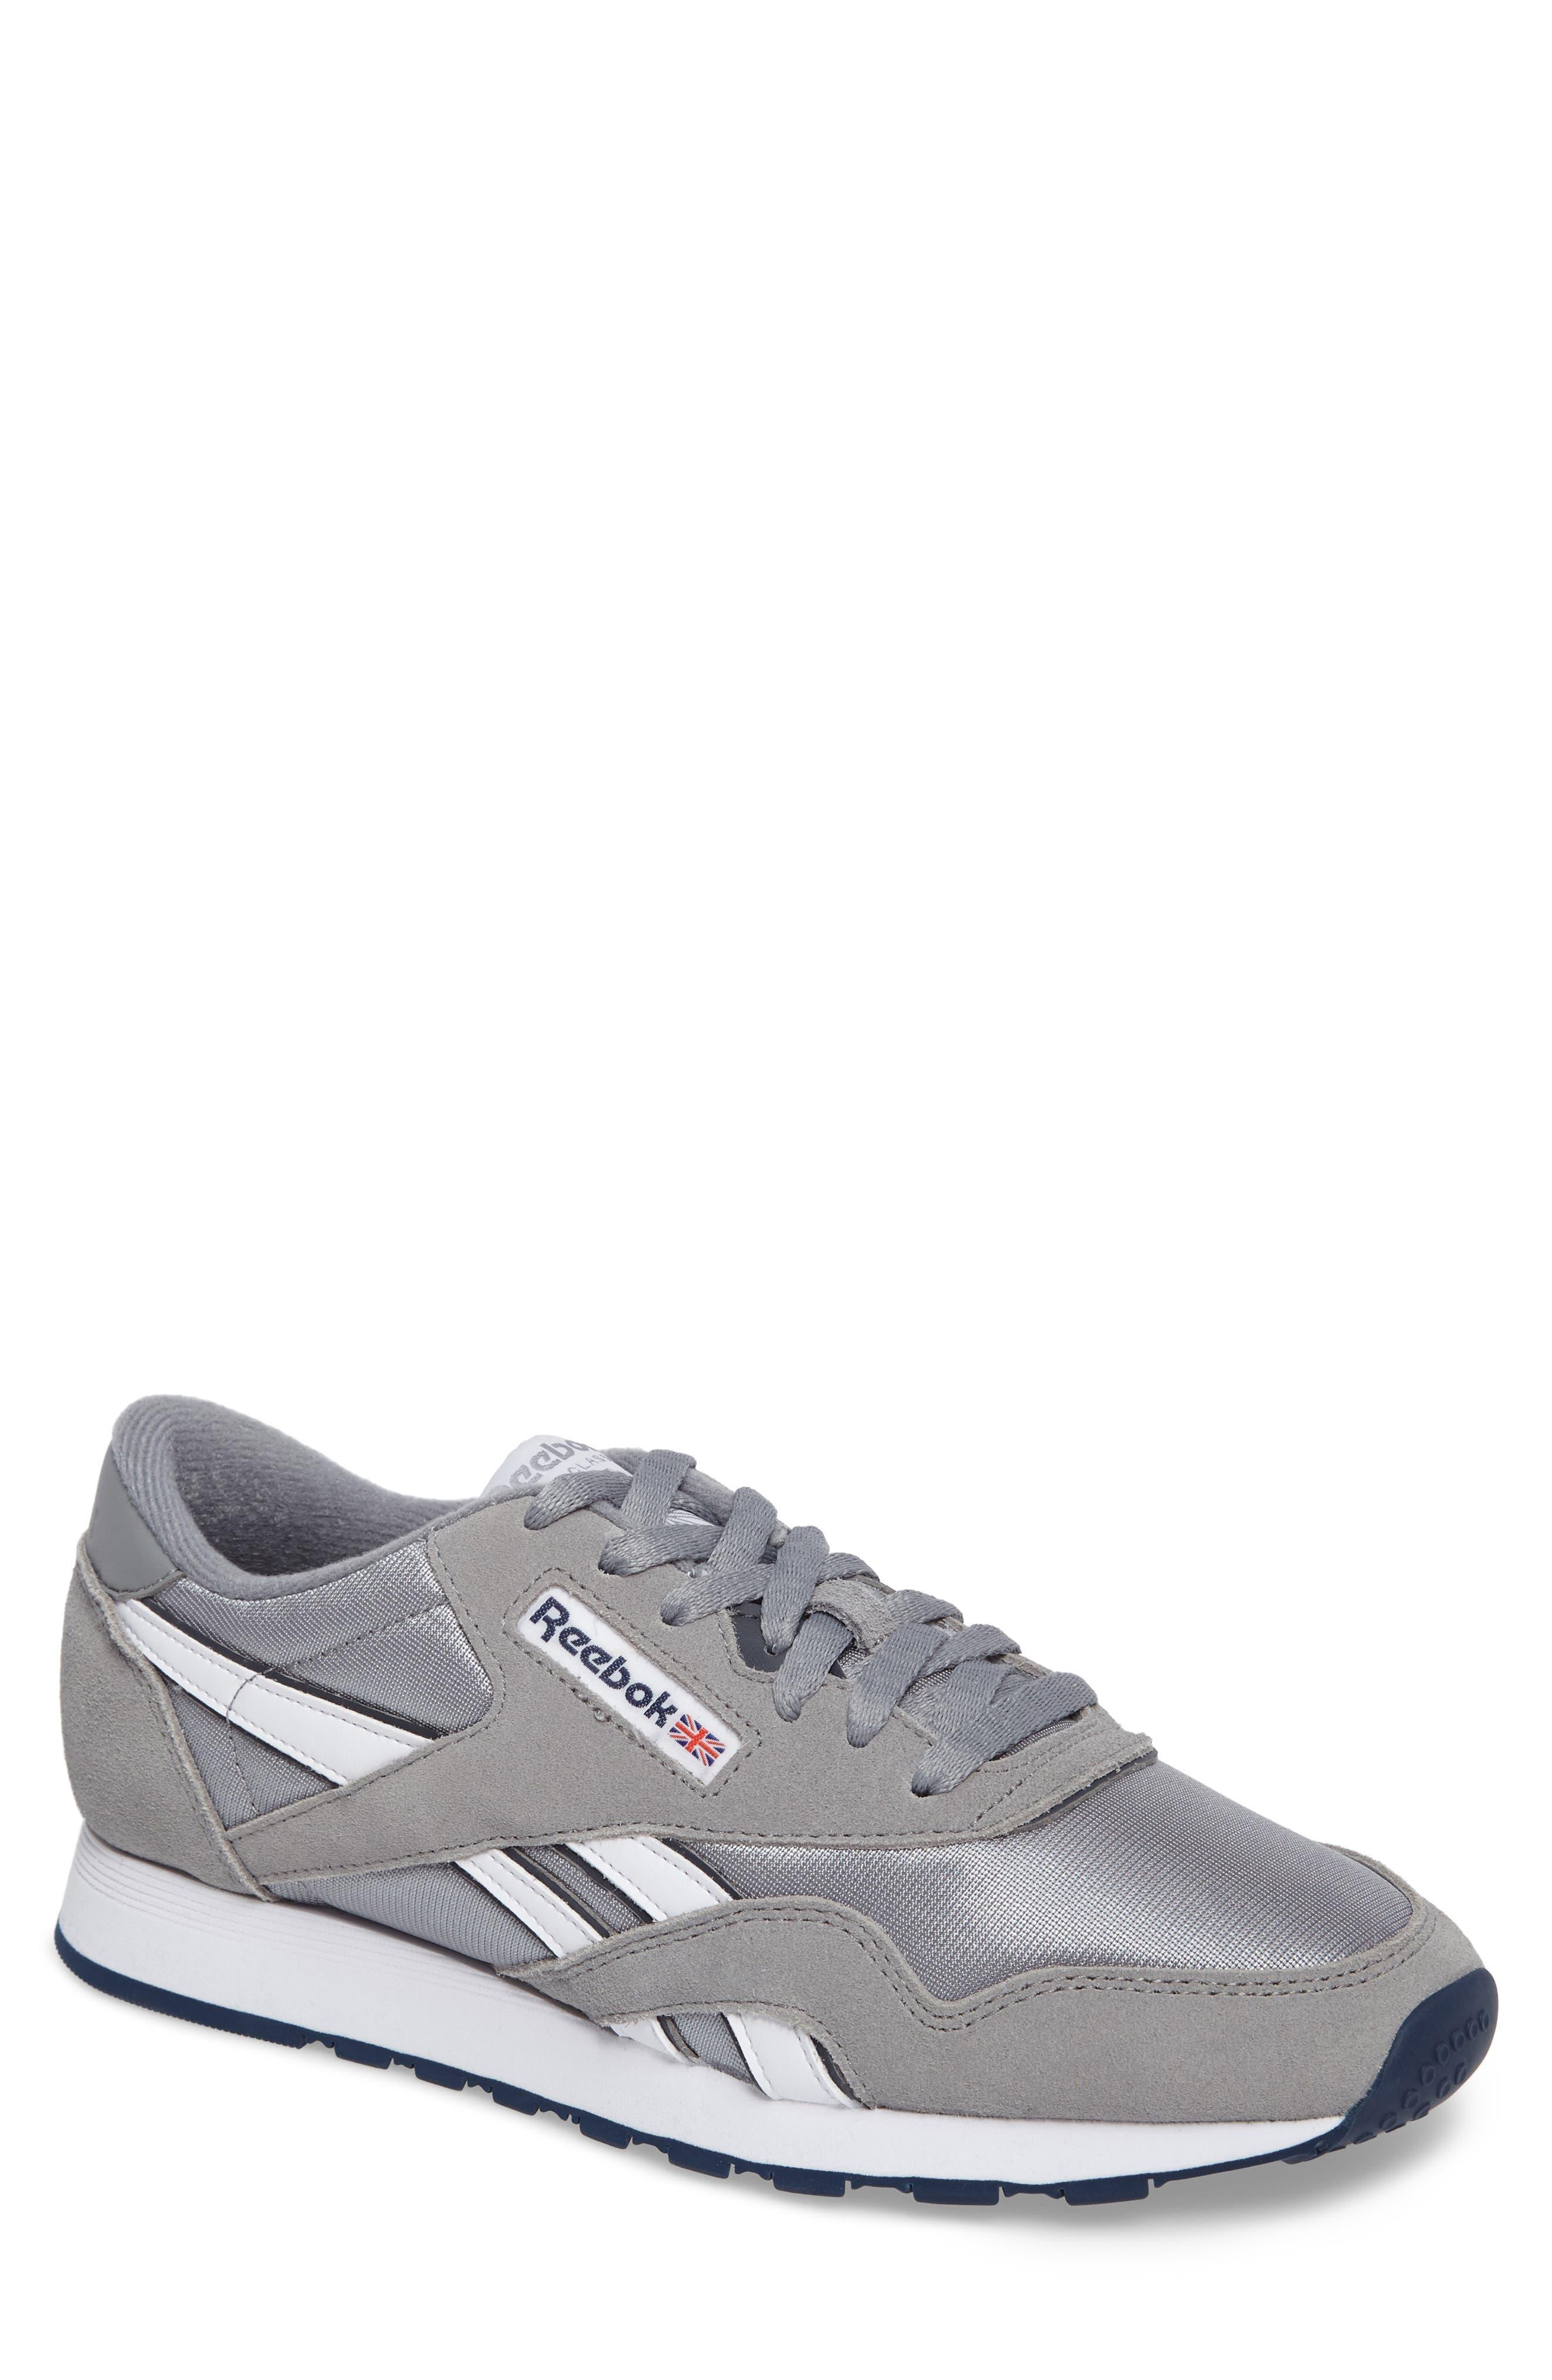 Main Image - Reebok Classic Nylon Sneaker (Men)